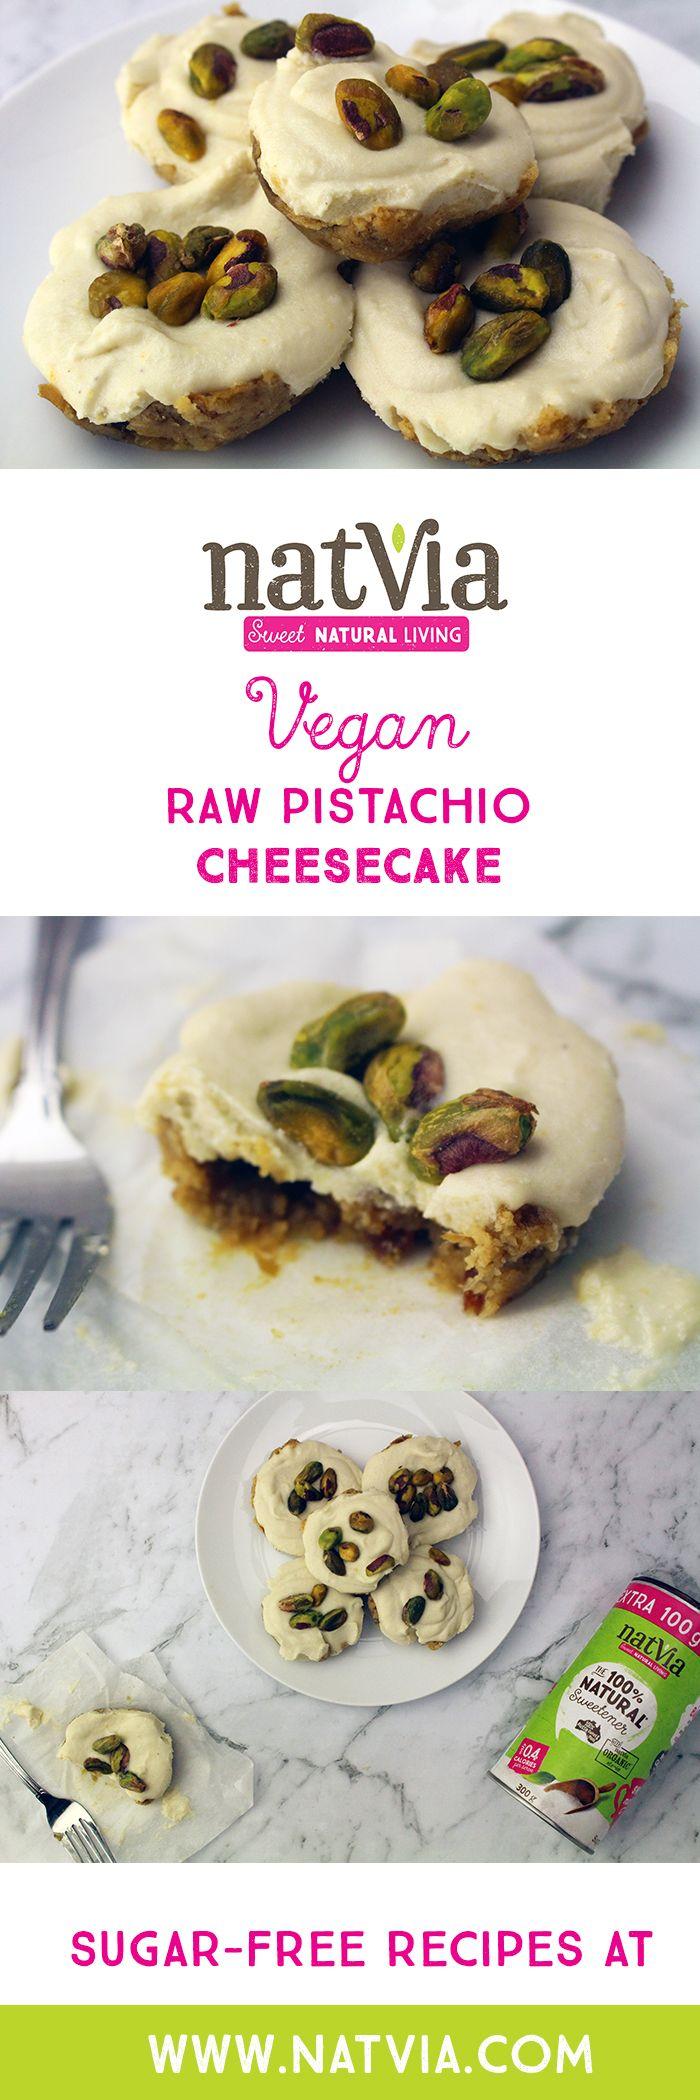 Whip up these #sugarfree Mini #Vegan #Pistachio #Cheesecakes.  - #Natvia #Healthy #recipe